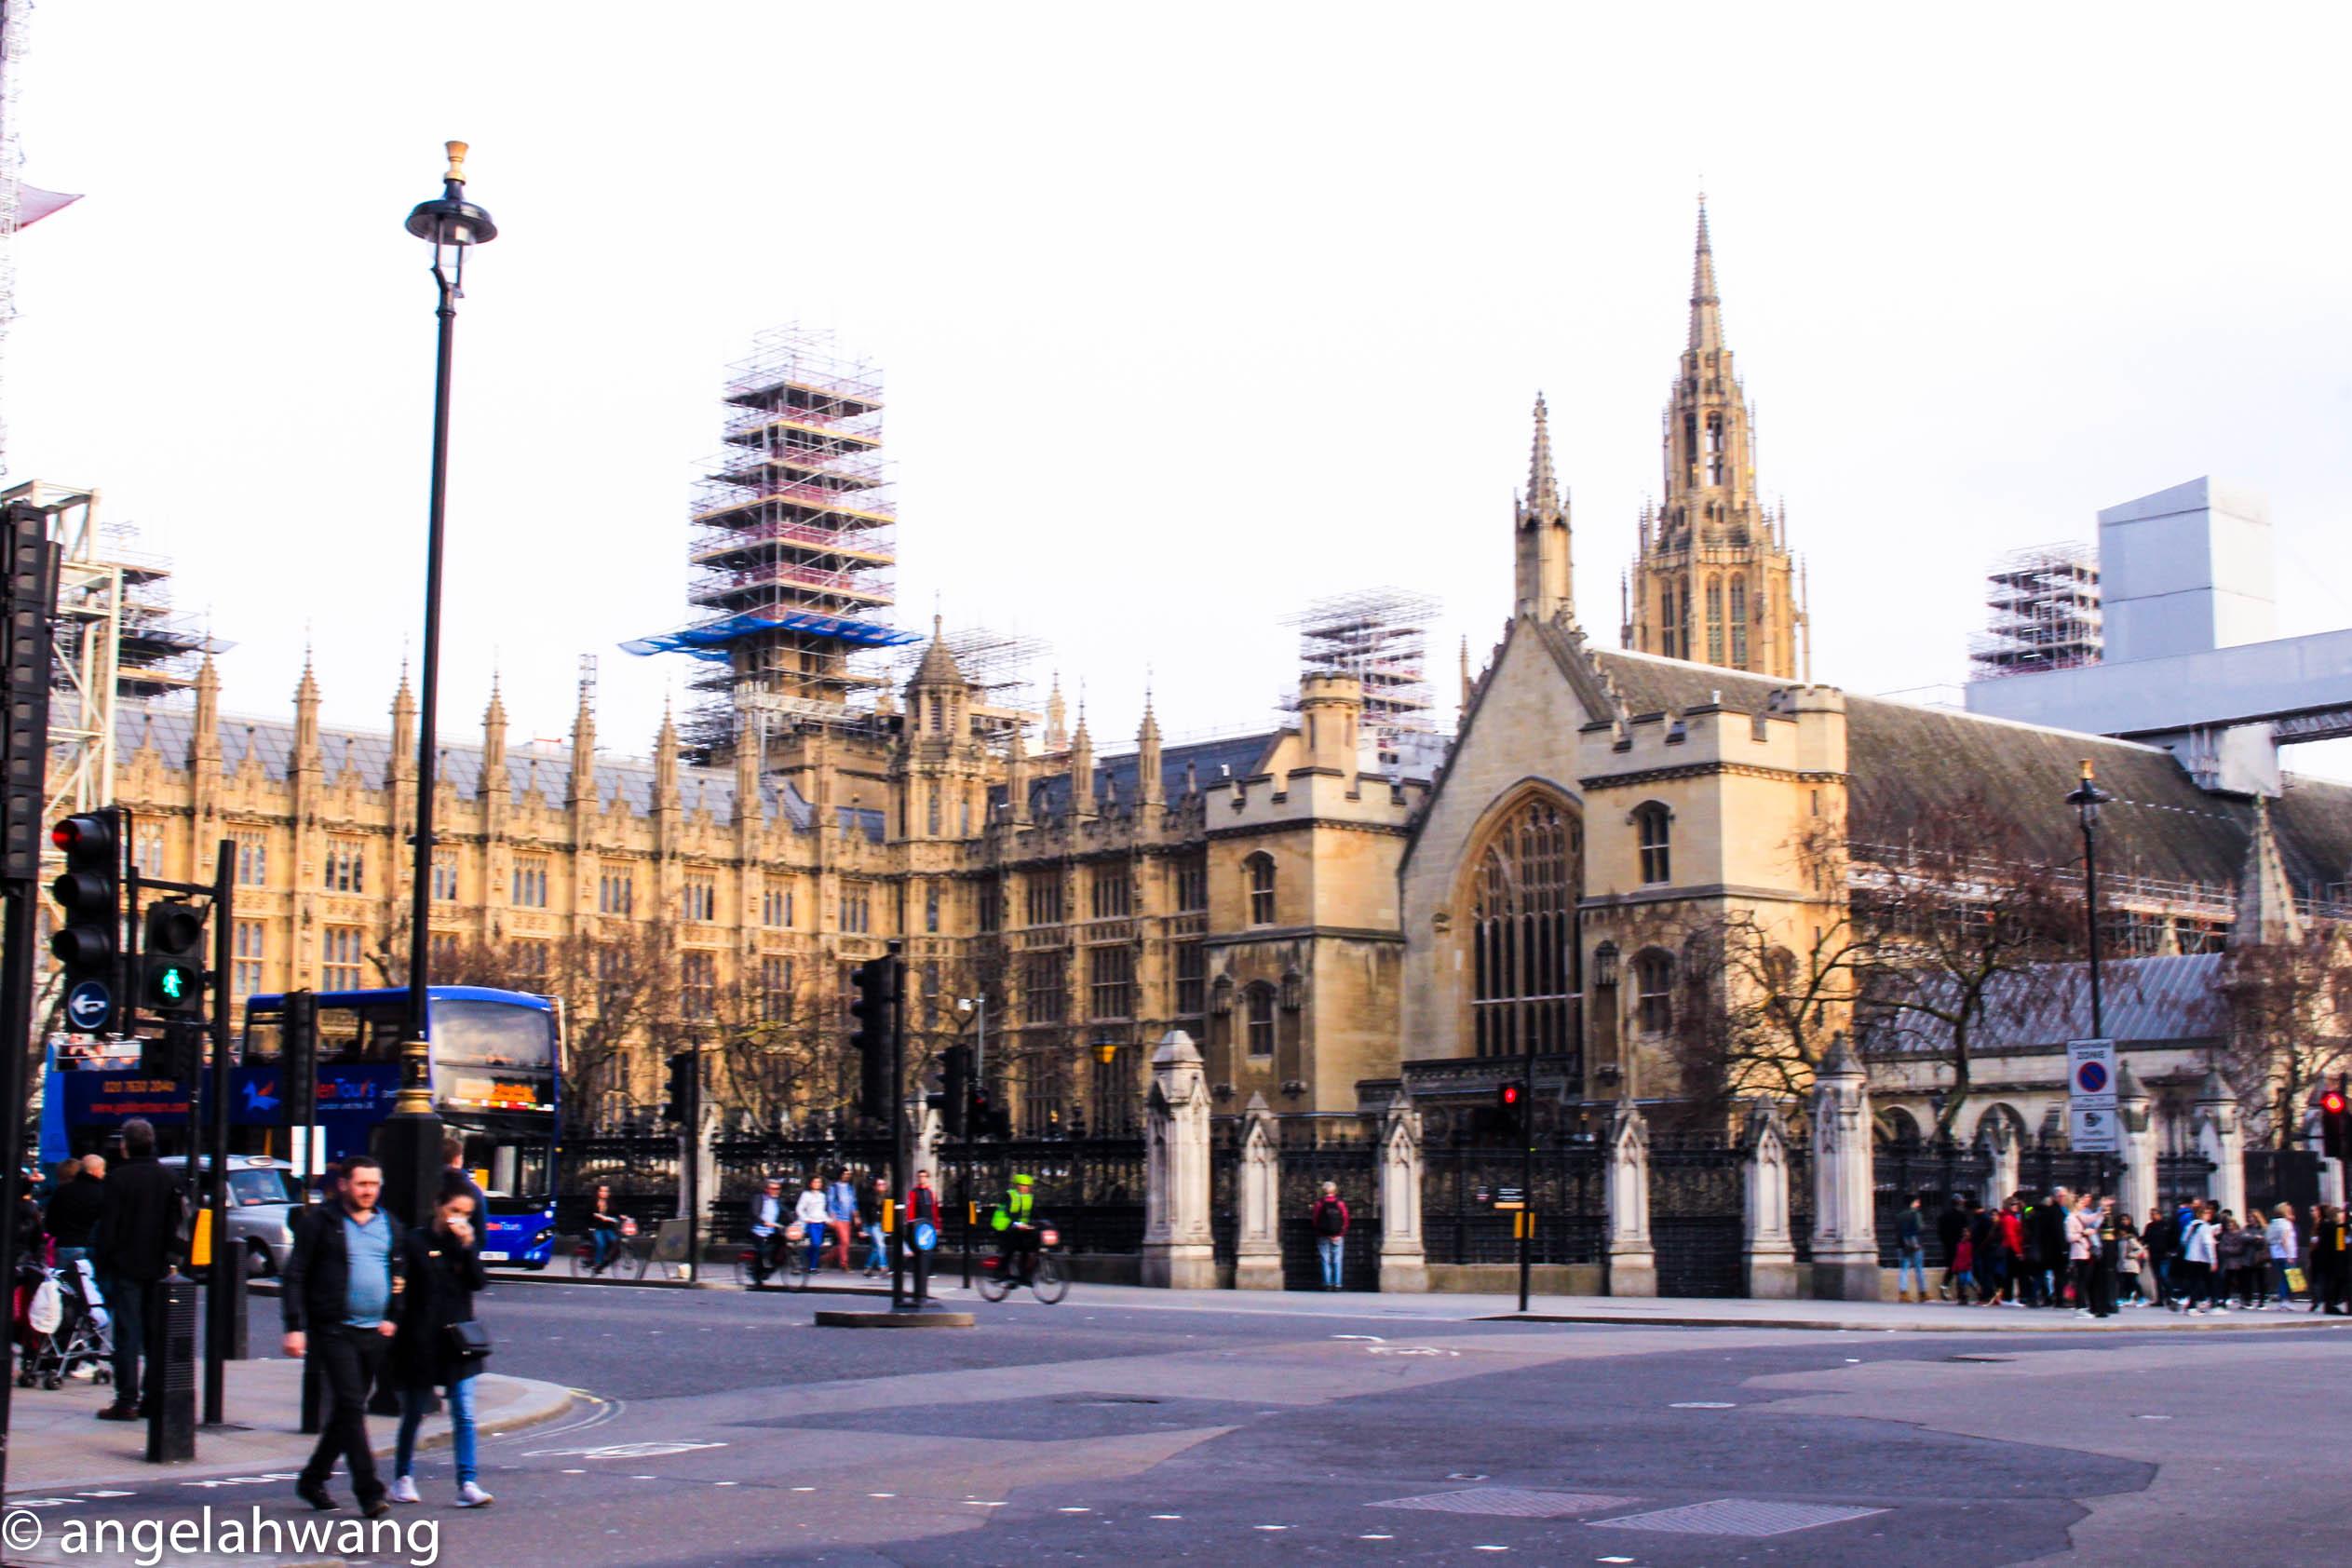 Central London - Big Ben